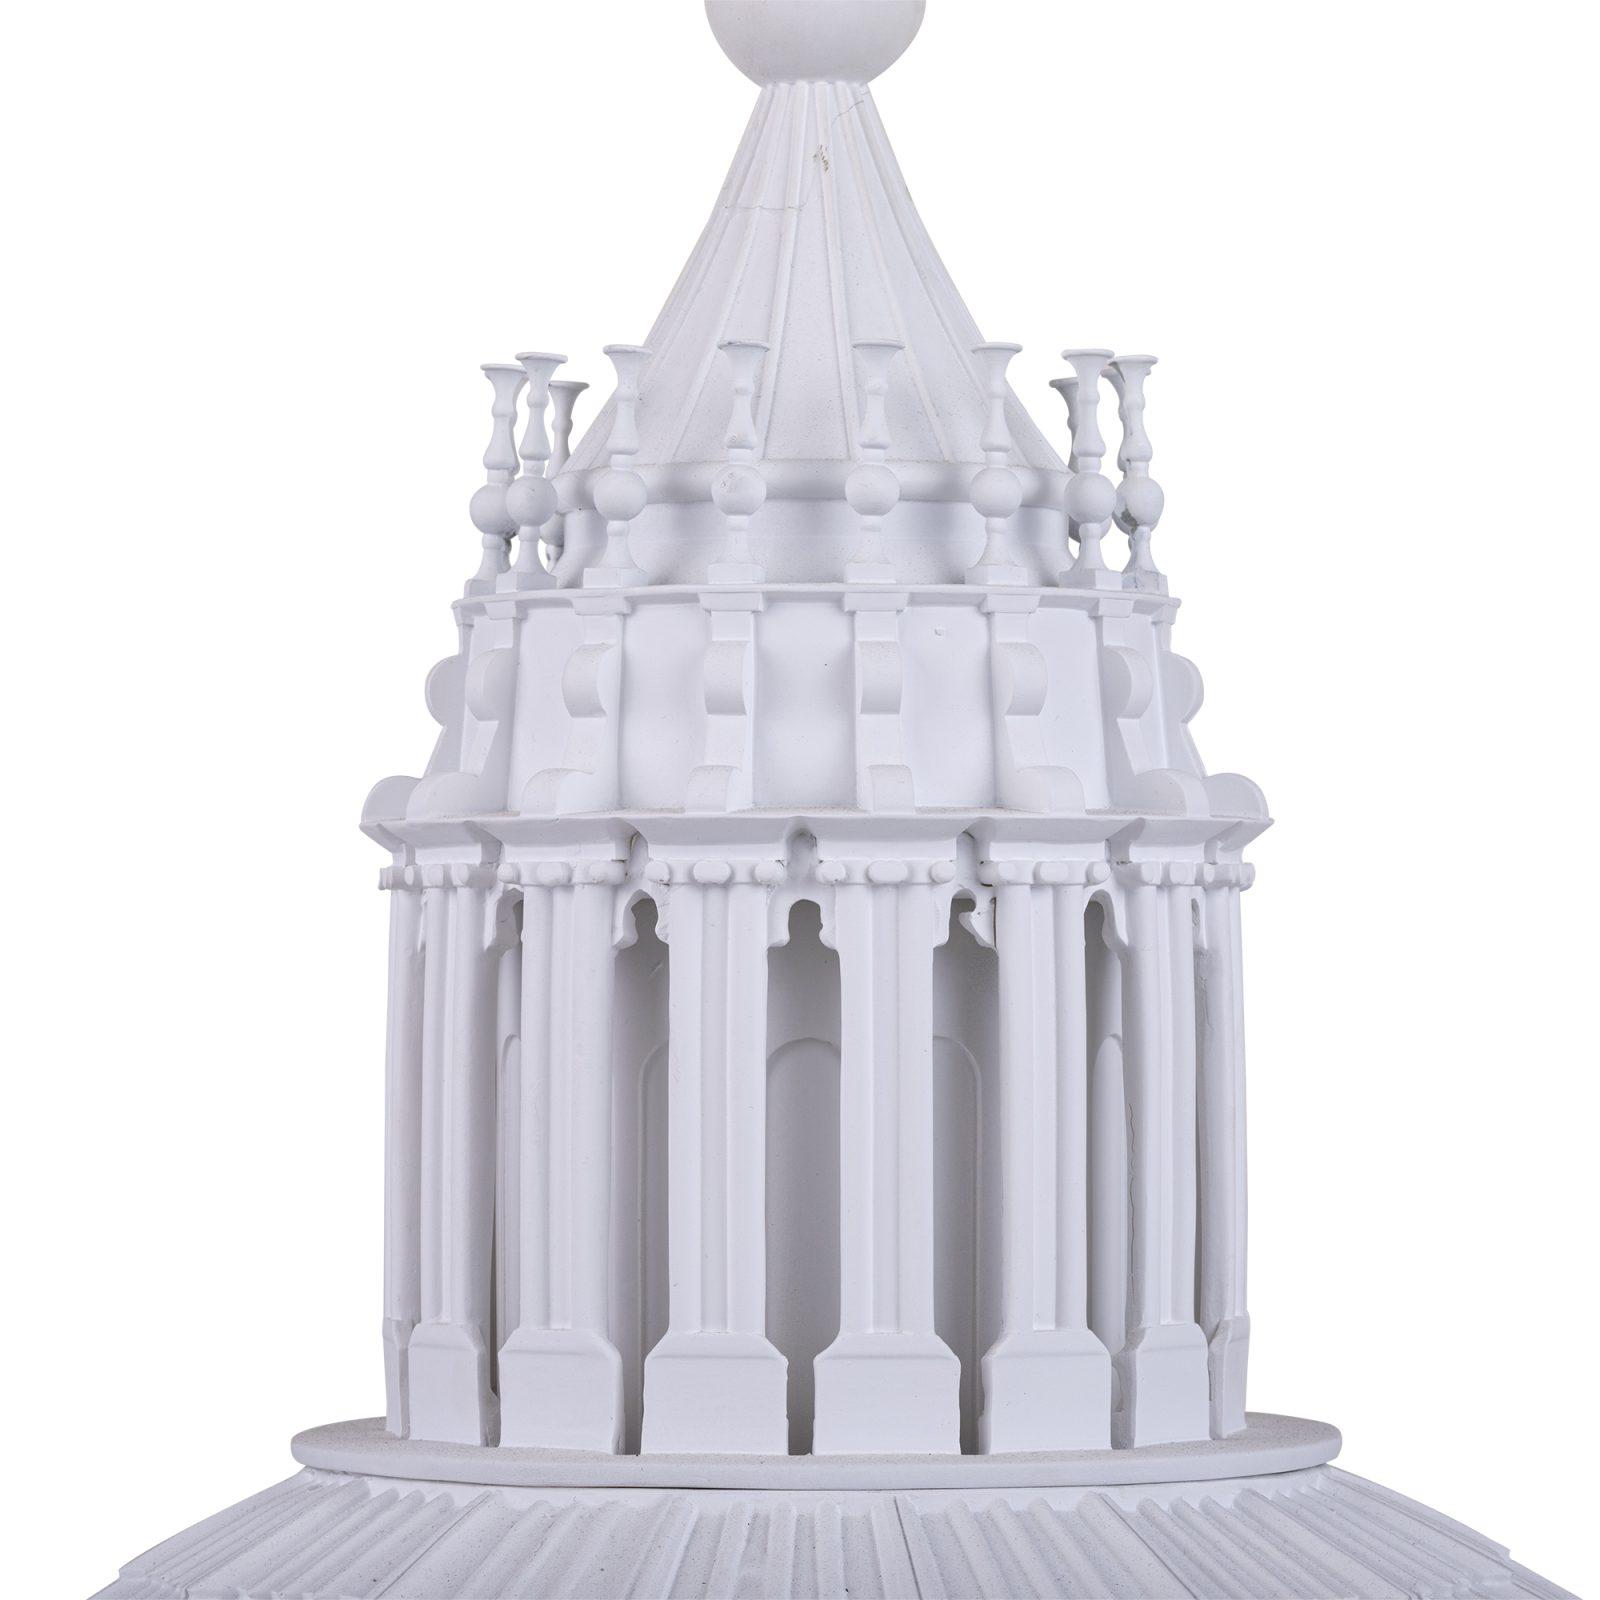 seletti-cupolone-lamp-white-4